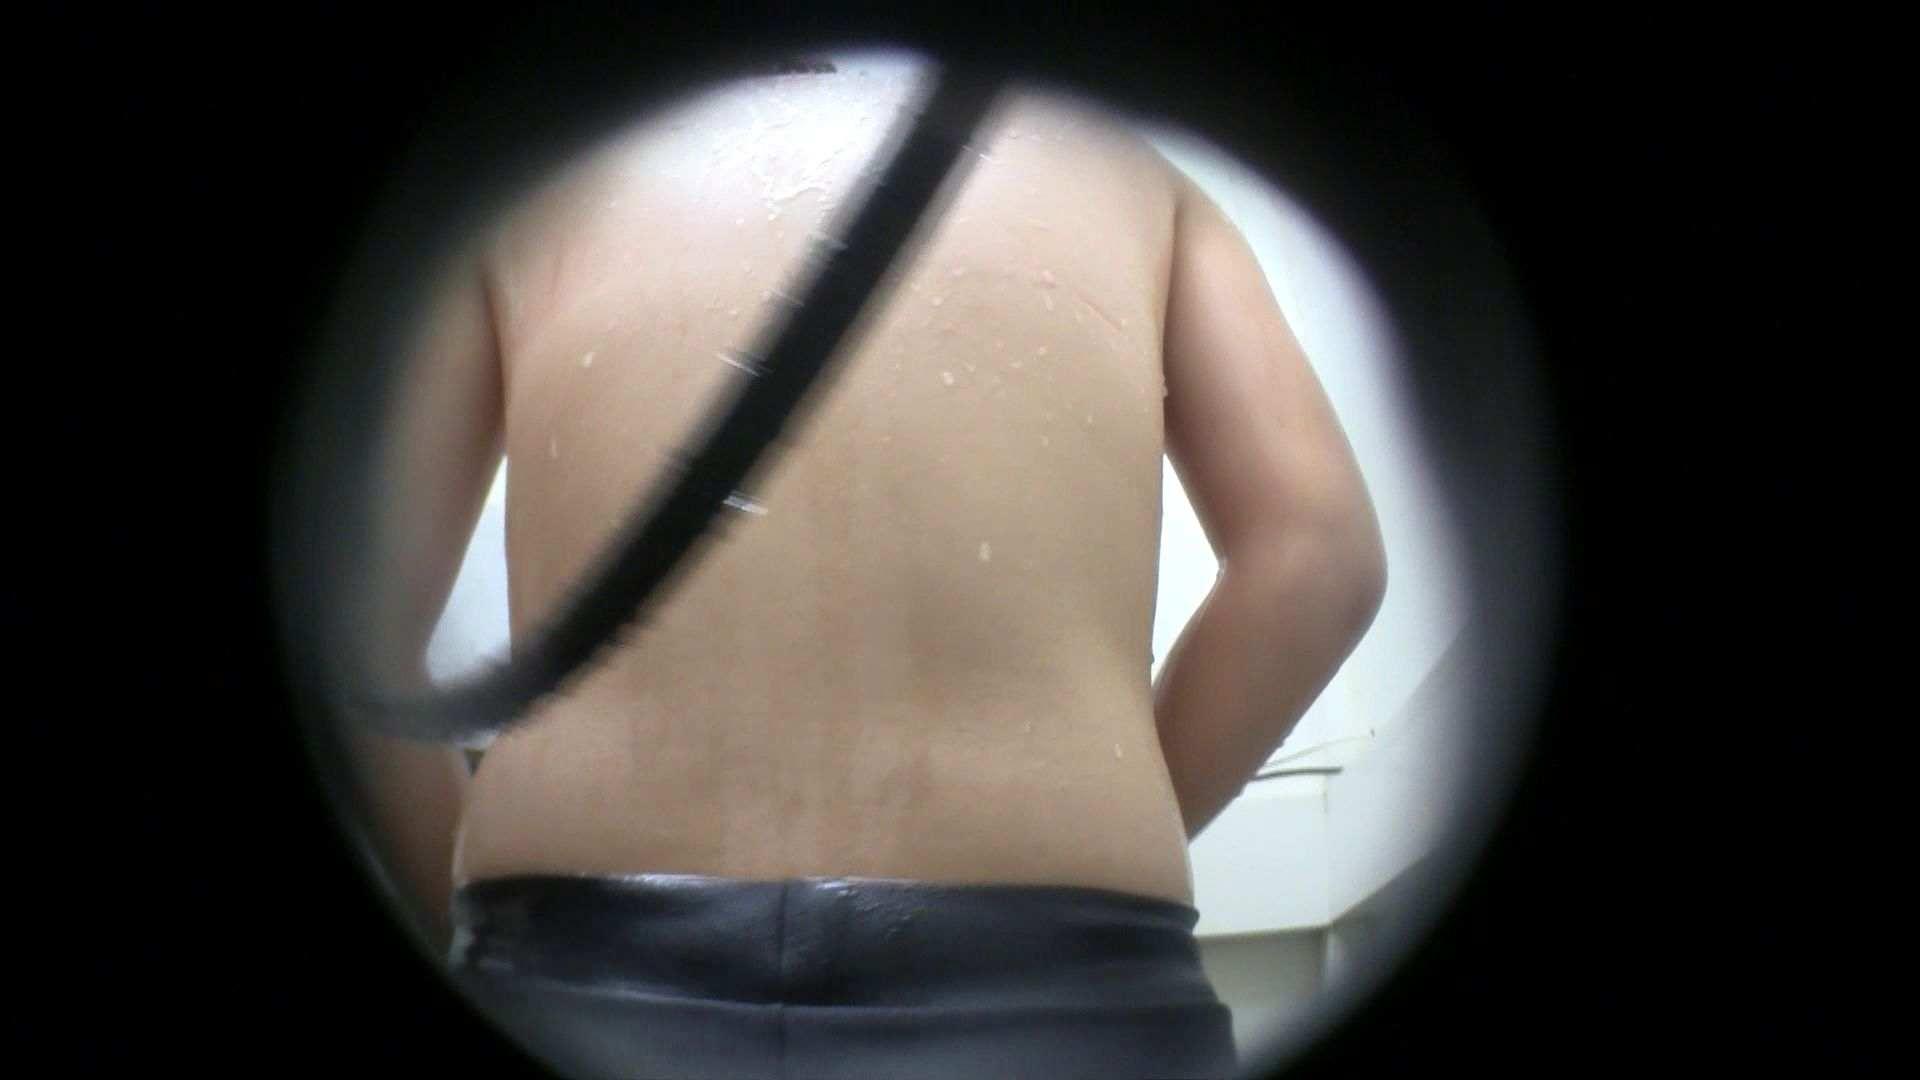 NO.43 乳首の先がチラ 背中でイメージして下さい チラ 盗み撮りAV無料動画キャプチャ 45pic 22